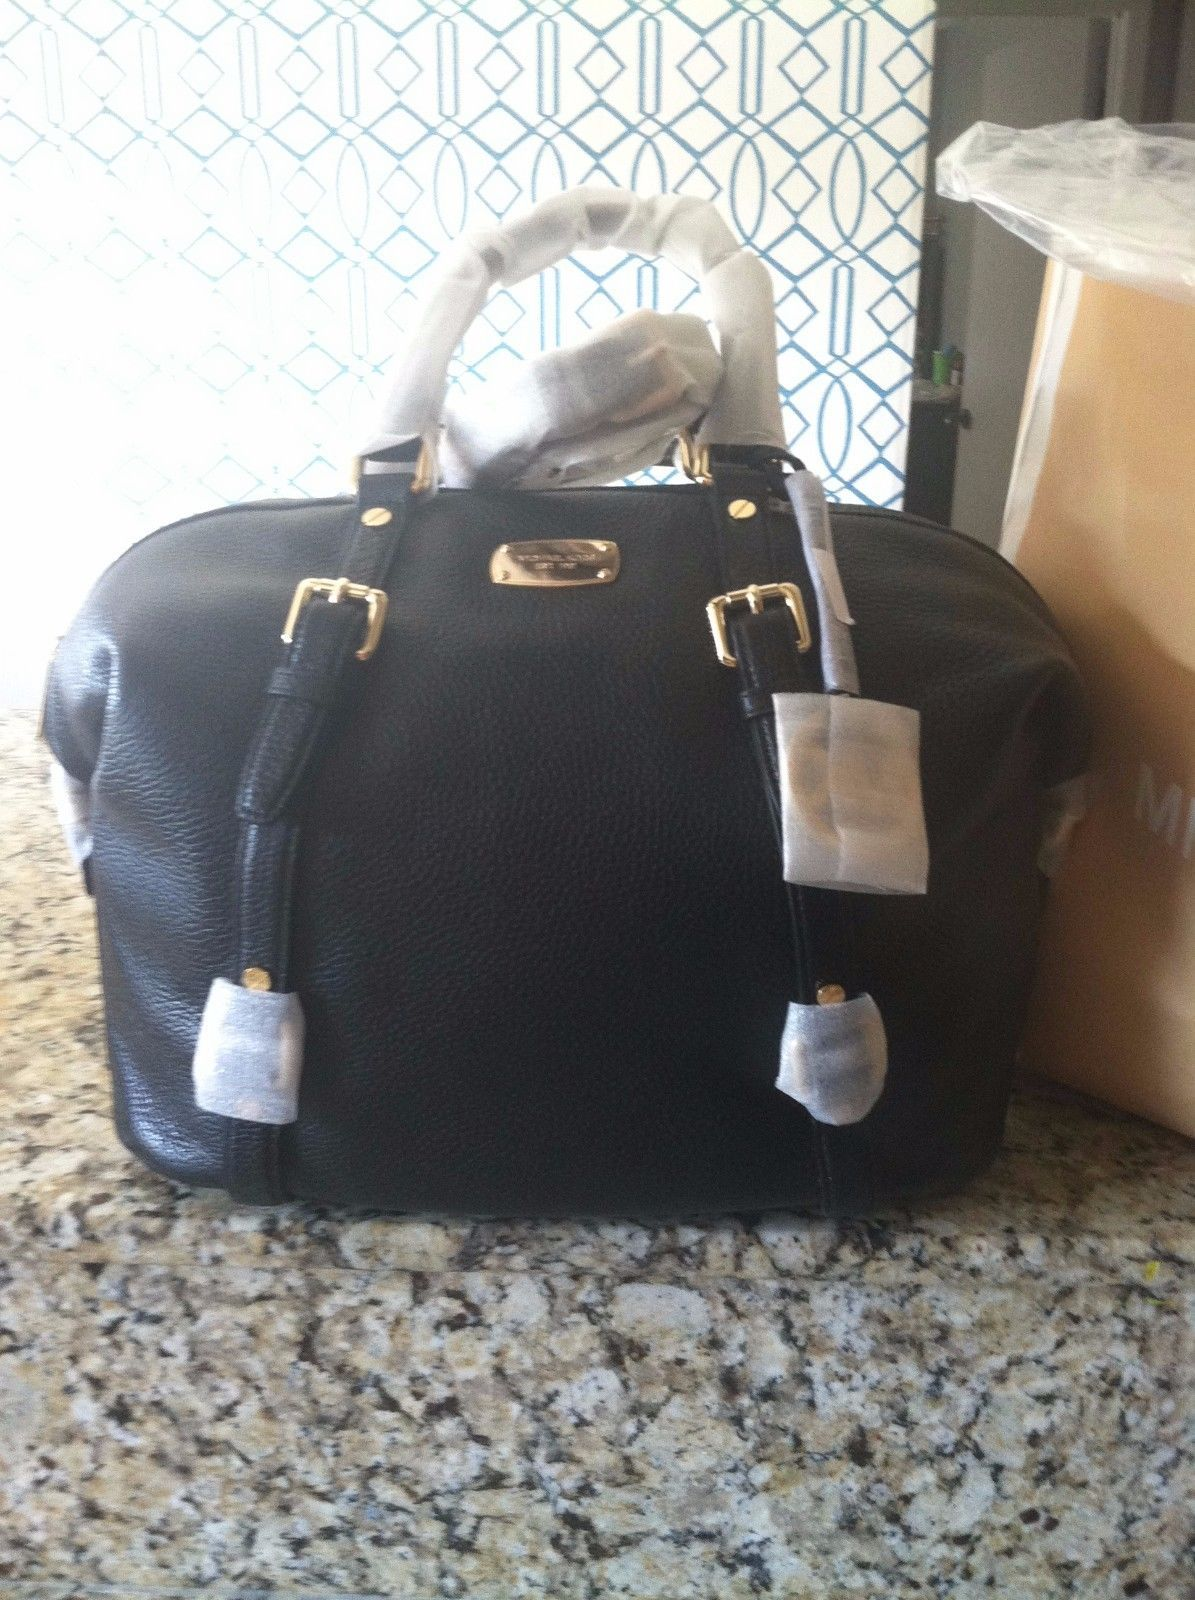 michael kors black bedford style handbag. brand new  https://t.co/f32IfGOSQi https://t.co/nbdH0XDJDw